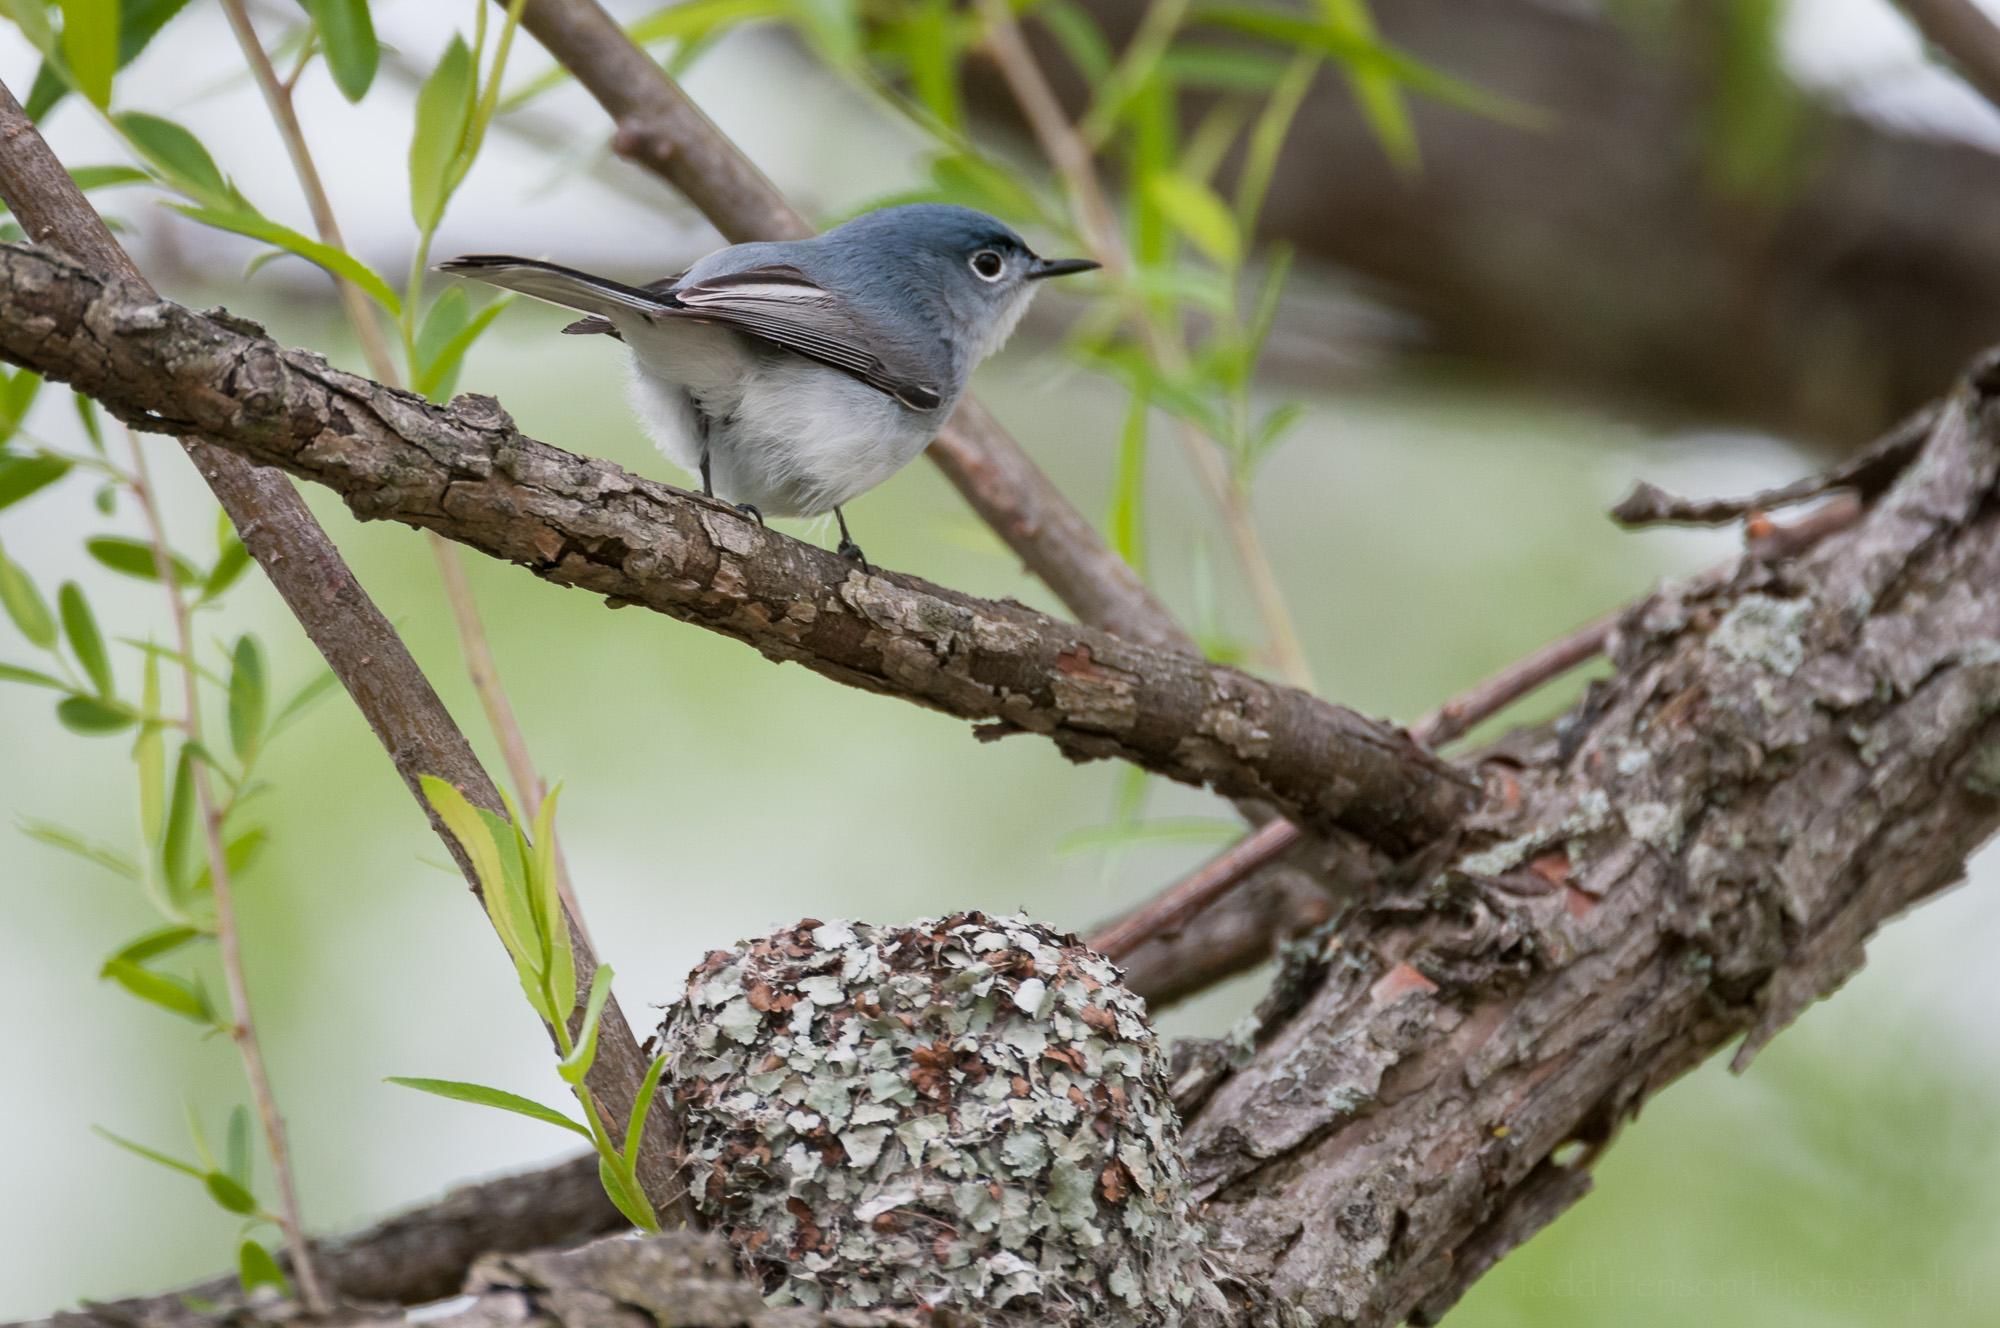 Male Blue-Gray Gnatcatcher sitting on a limb above the nest